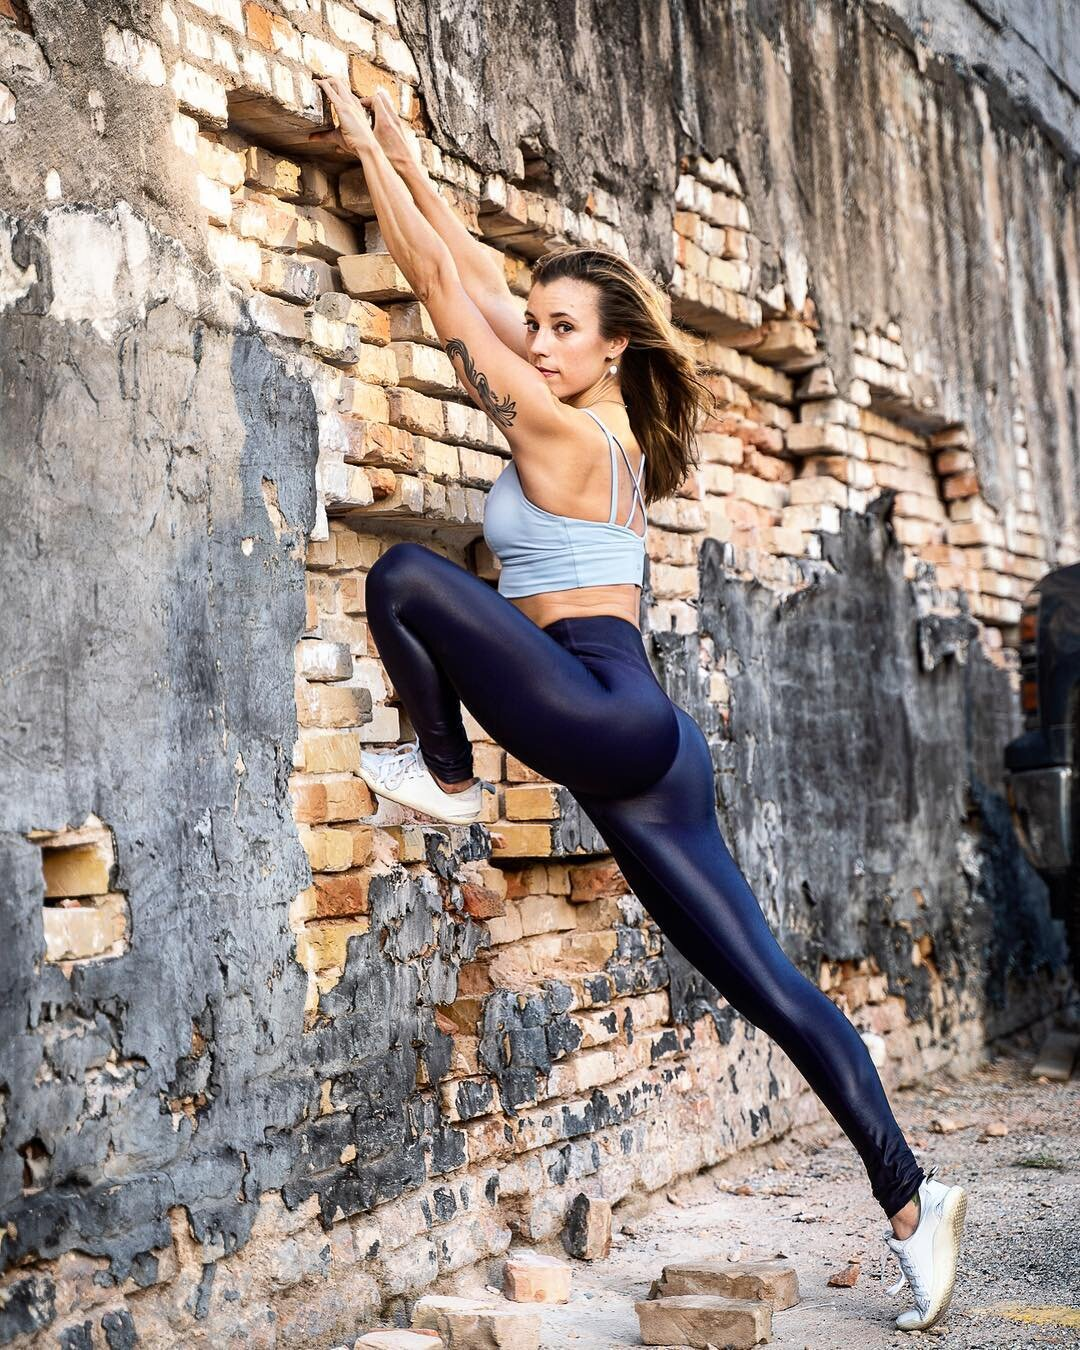 Lauren Browny Yoga austin by Weston Carls.jpg